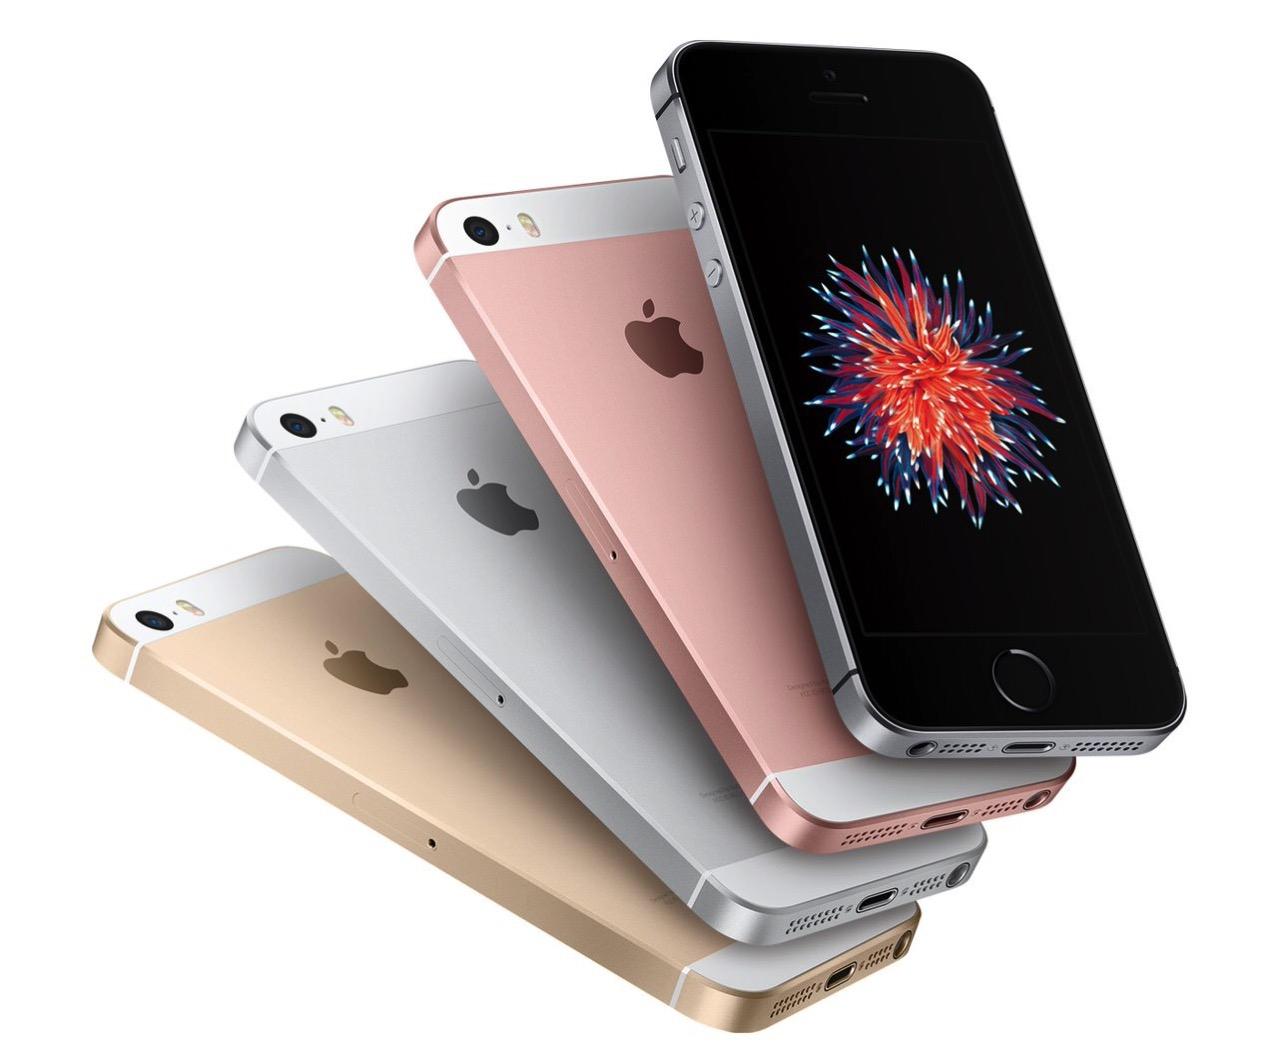 【iOS 13】iPhone SE・5s・6をサポートしない可能性あり?